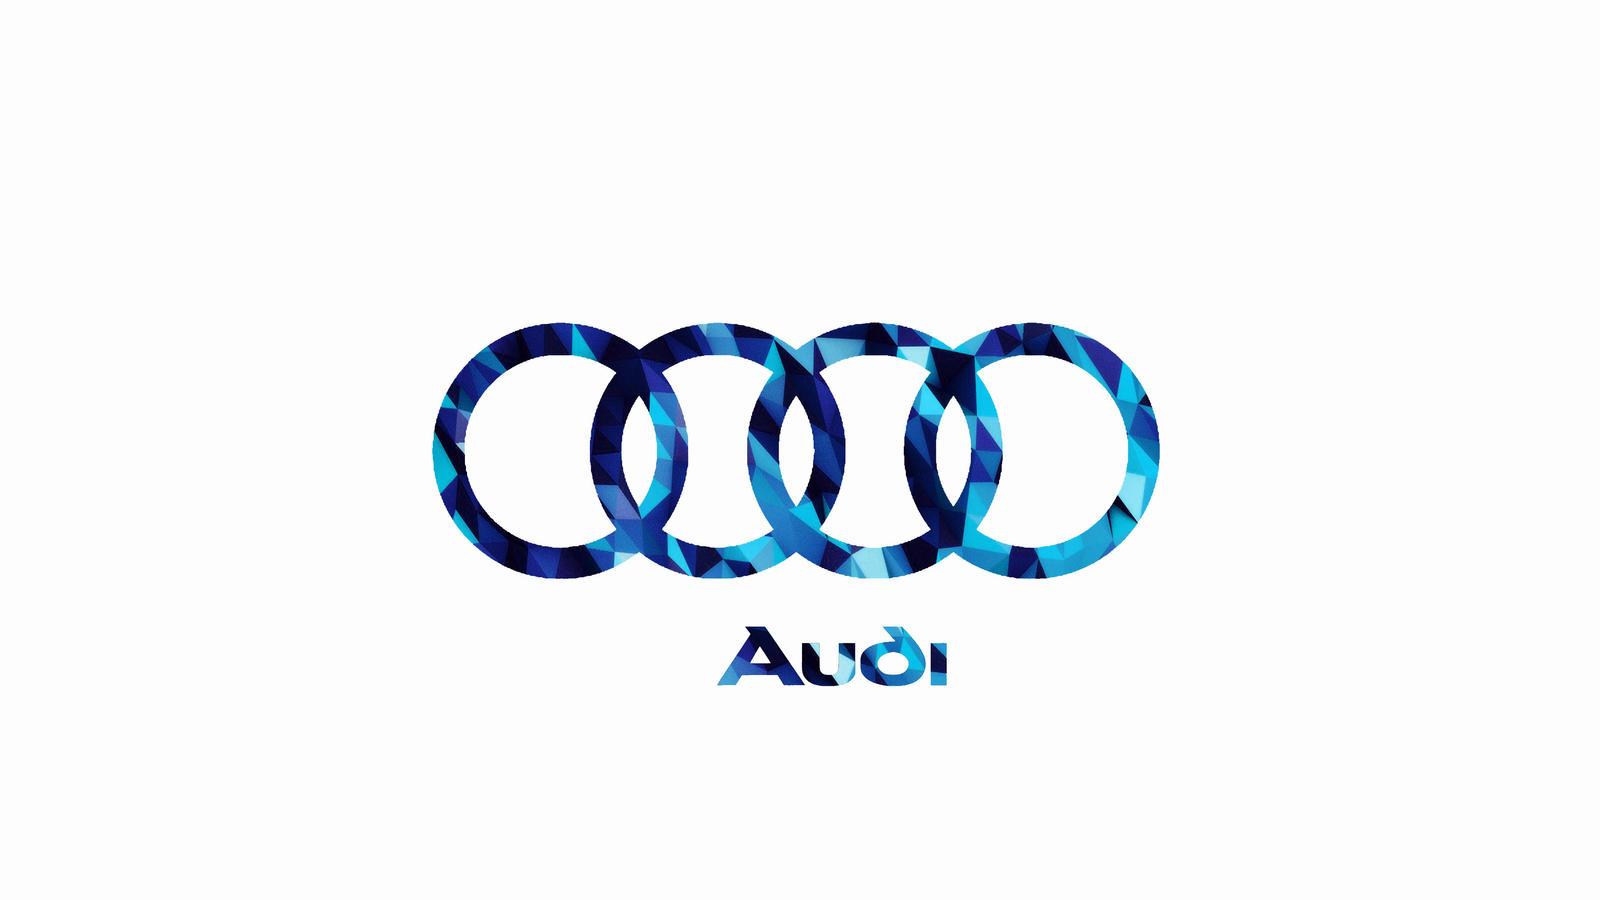 Audi Logo By Mojojojolabs On Deviantart